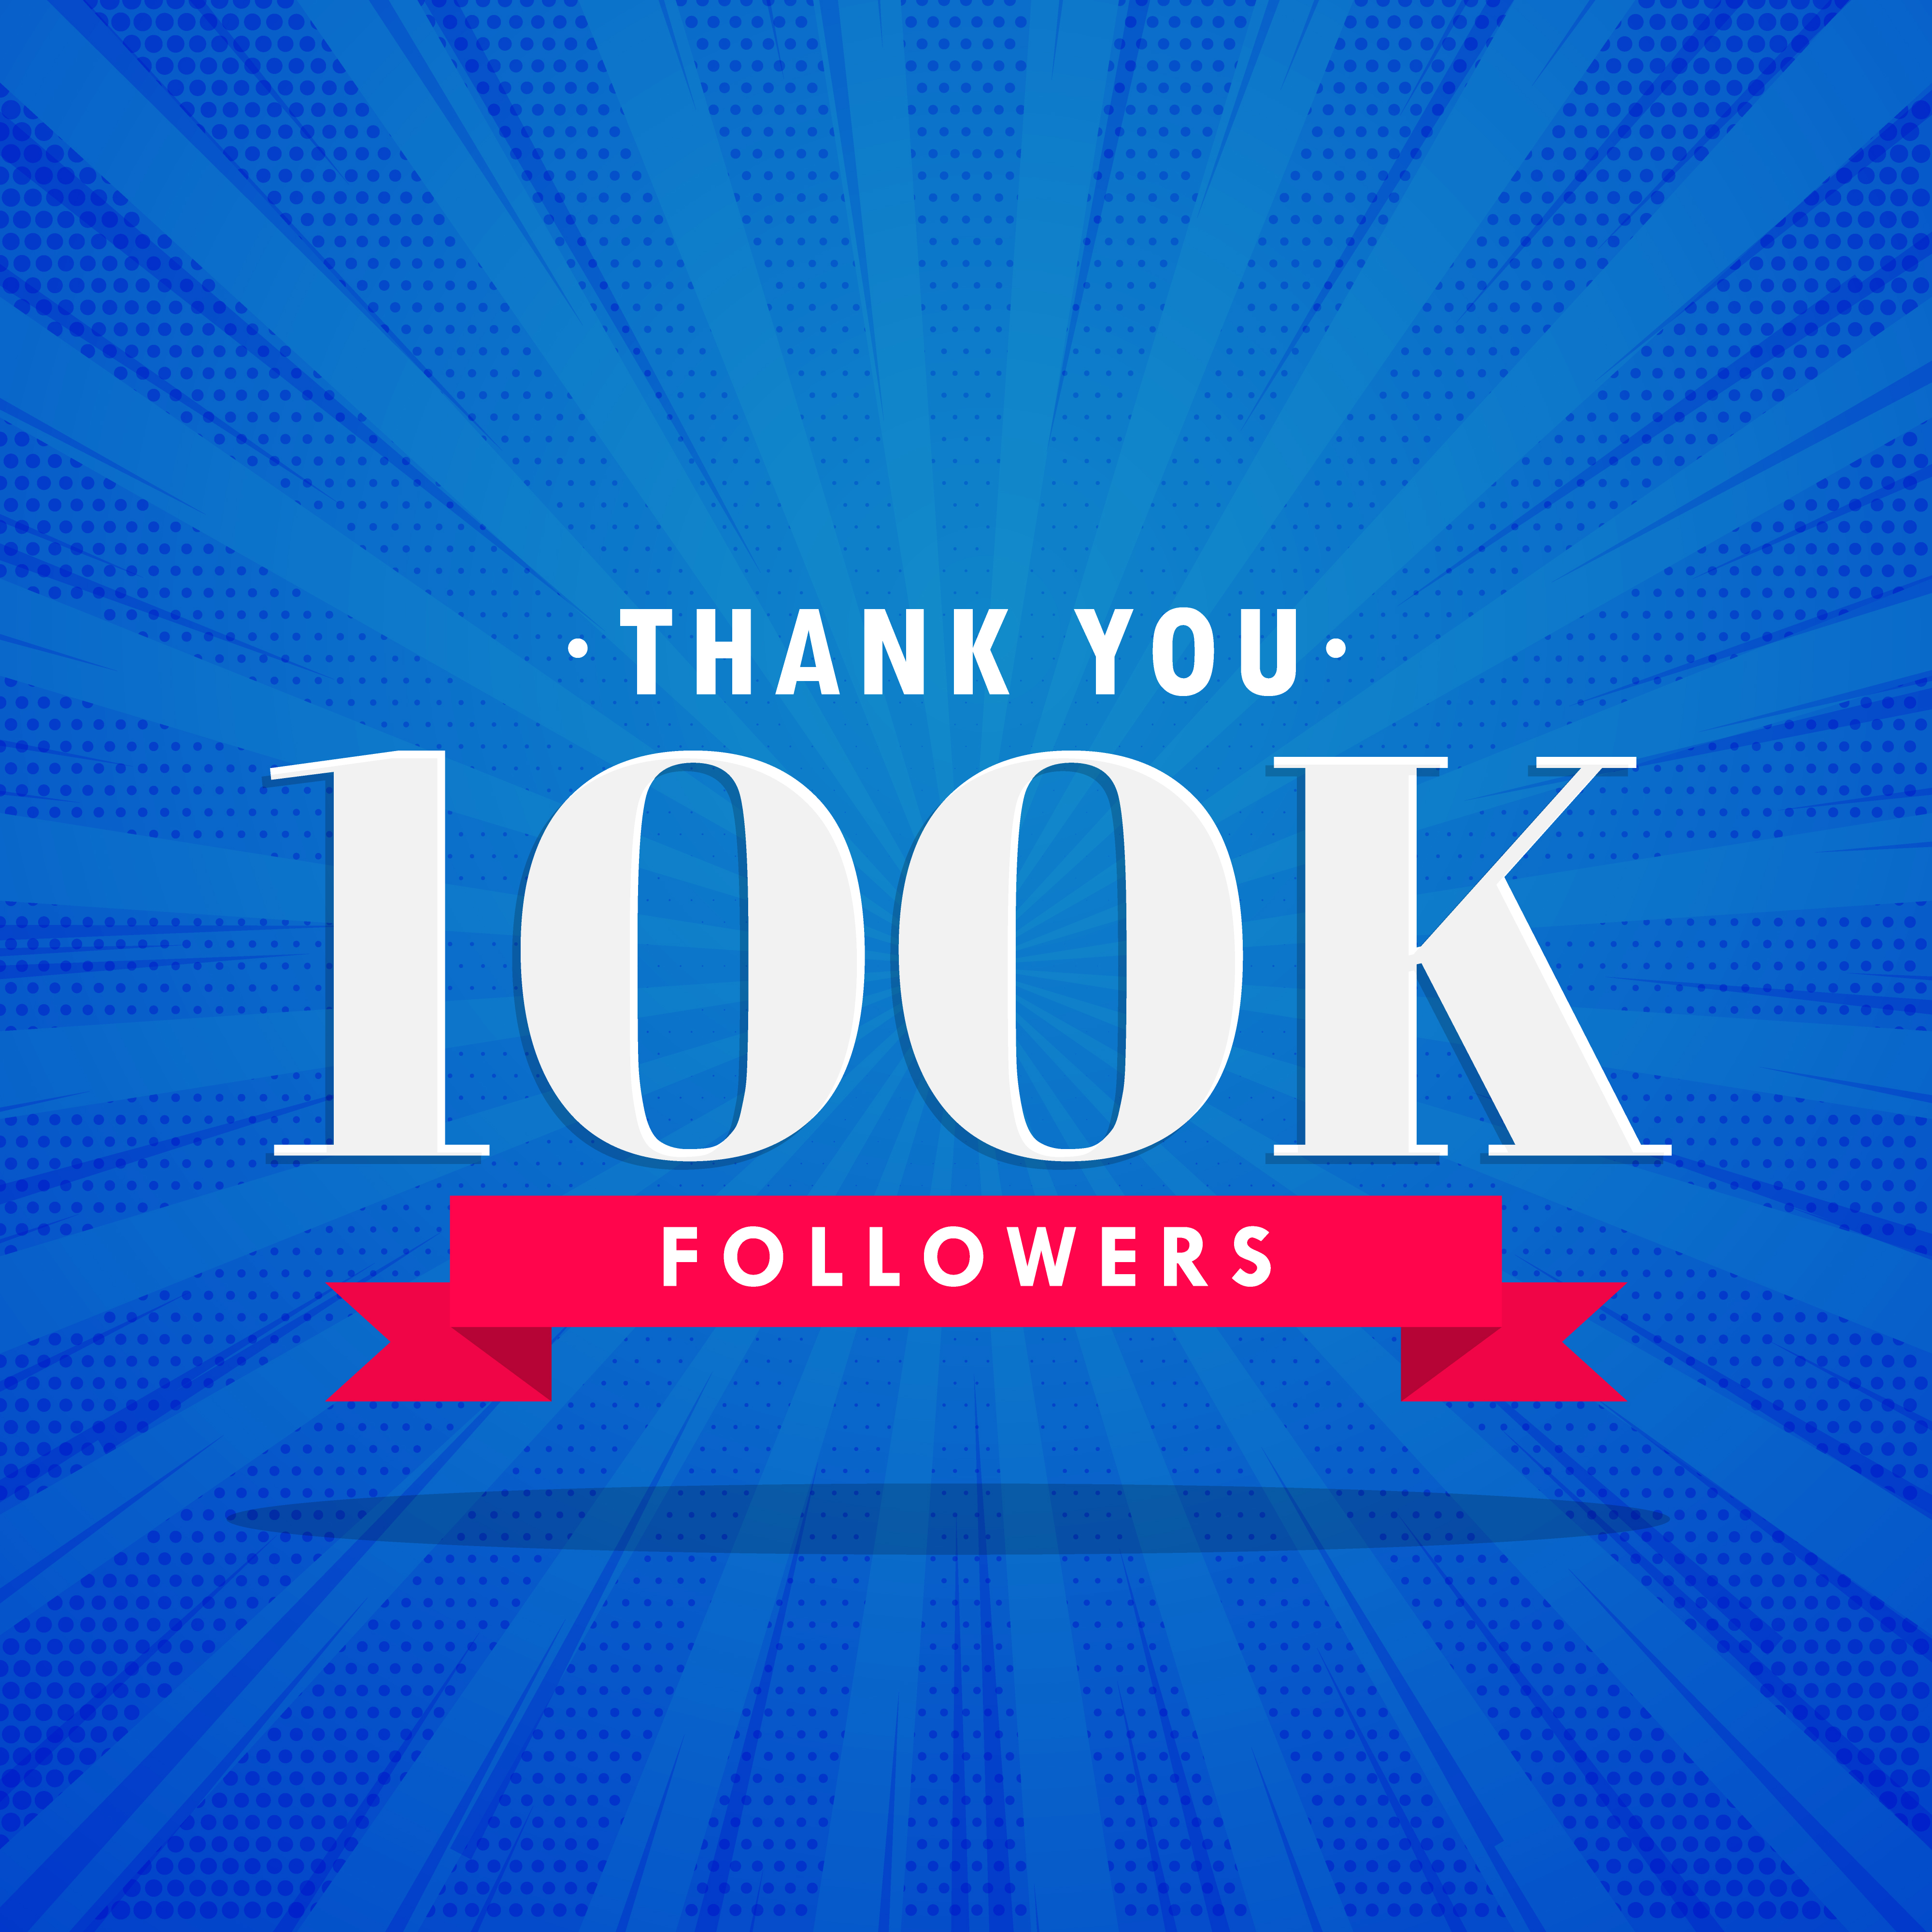 1000 follower celebration - 3 4